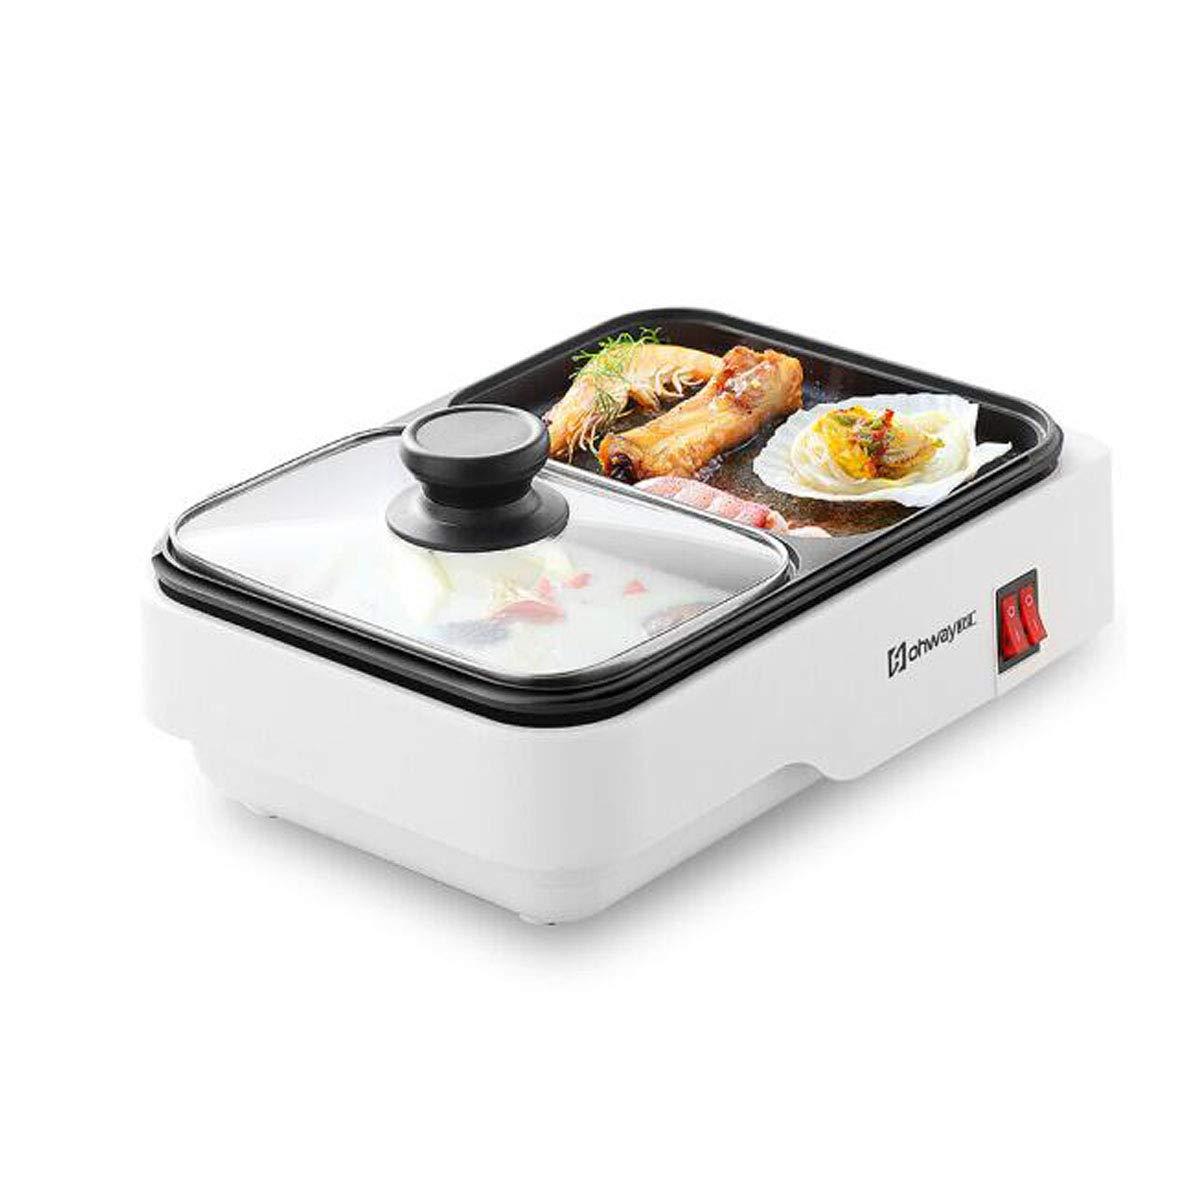 Wuhuizhenjingxiaobu001 電気フライパン、電気禁煙家庭用オーブン、電気鍋、家庭用ダイニング べたつかない (Color : White)  White B07SQV866B